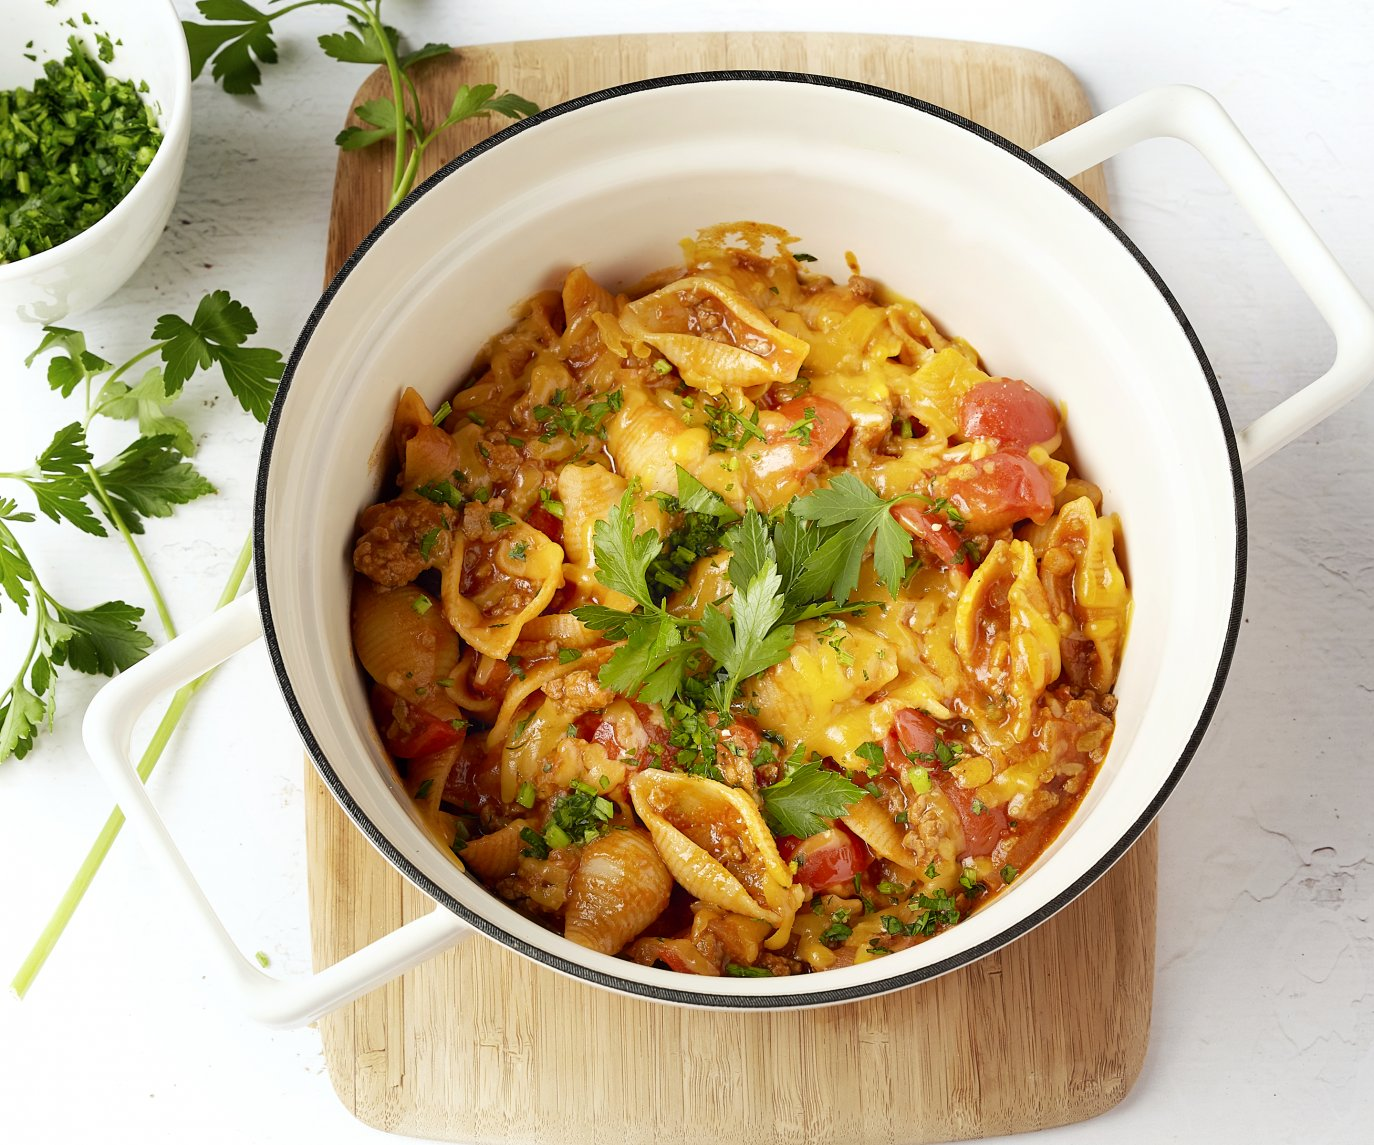 Eénpotspasta 'chili con carne'-style